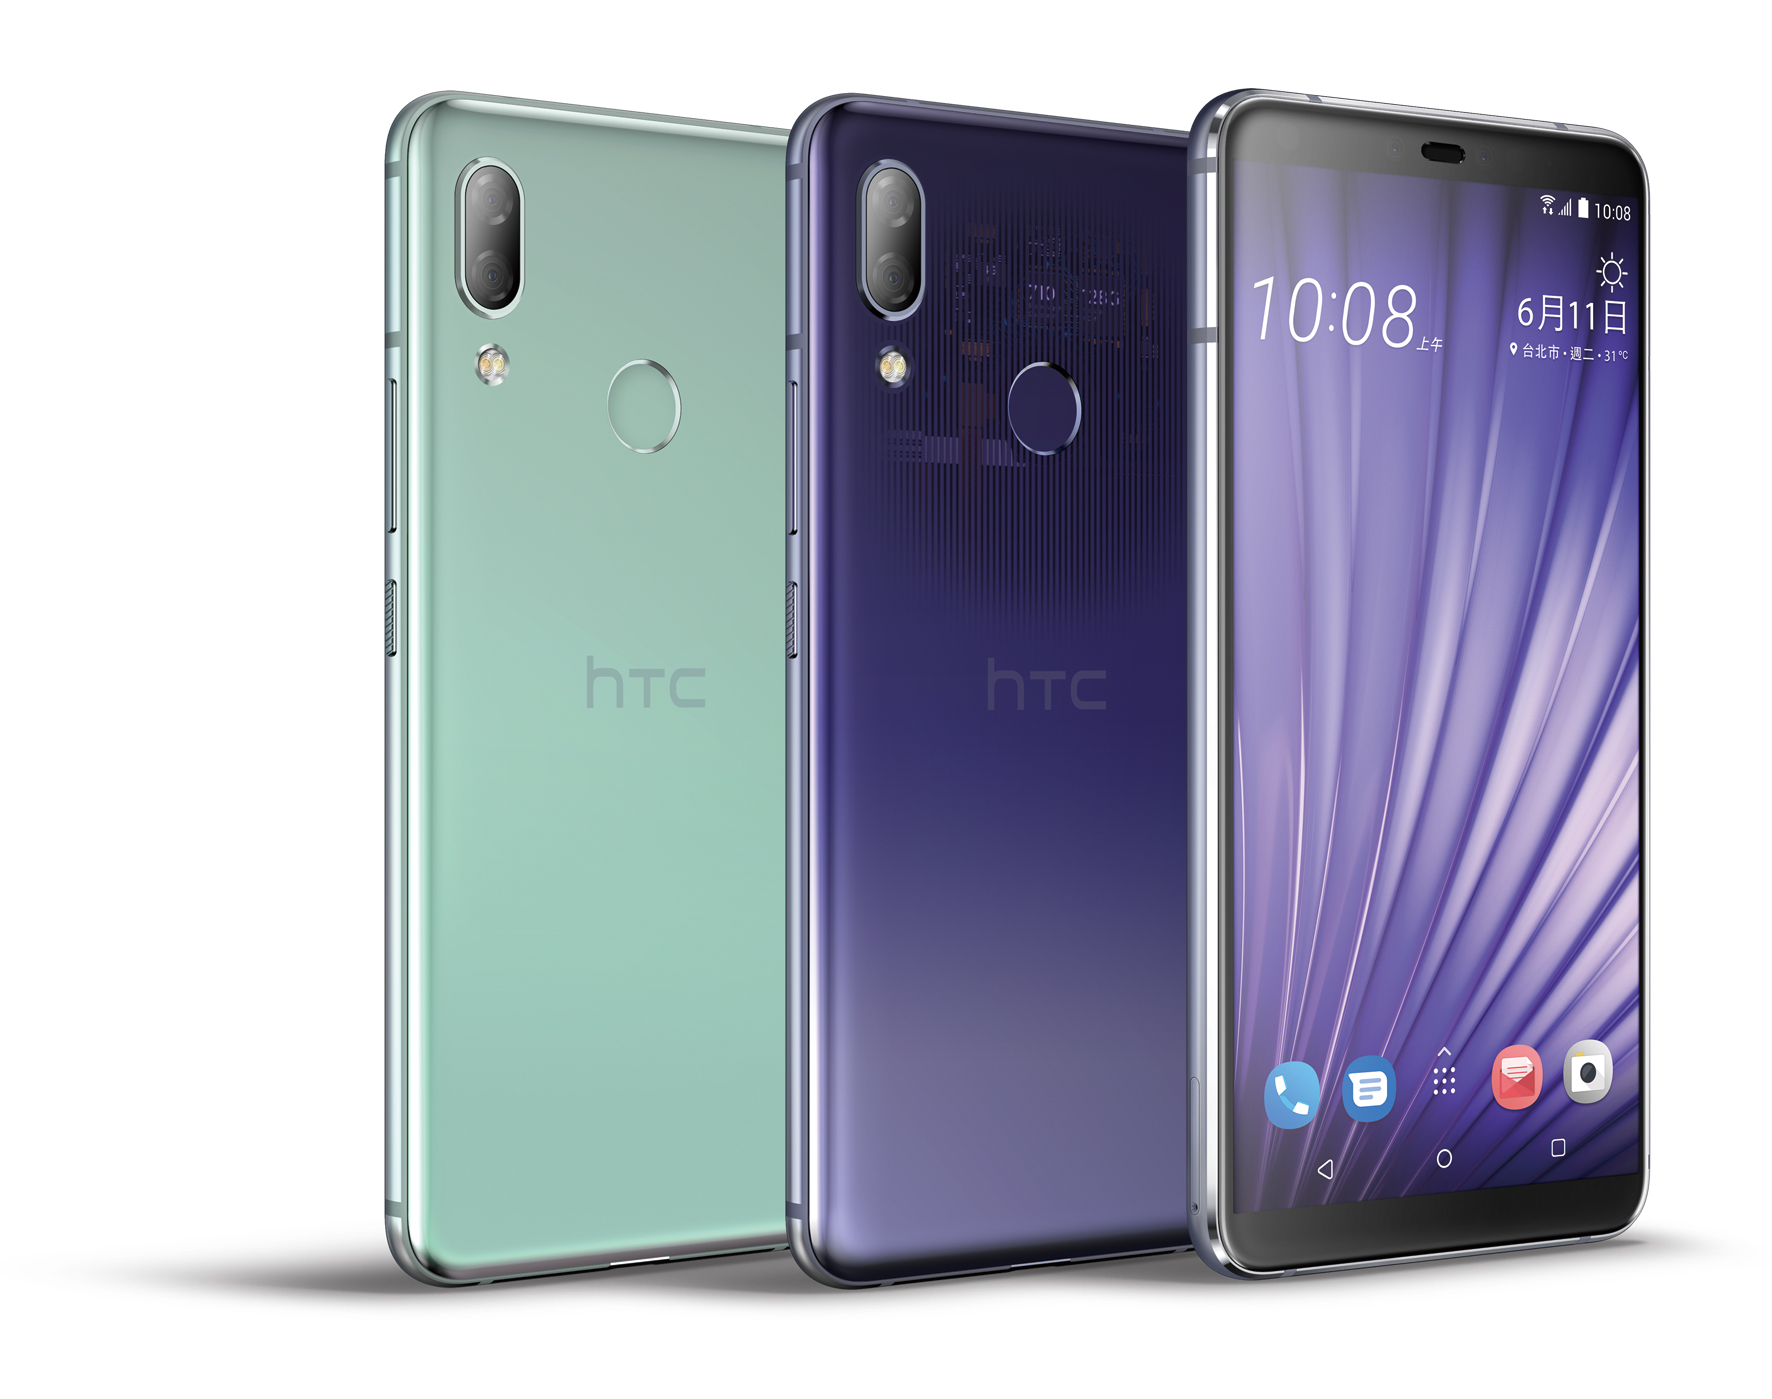 HTC新聞照片(超凡紫及謙和綠)